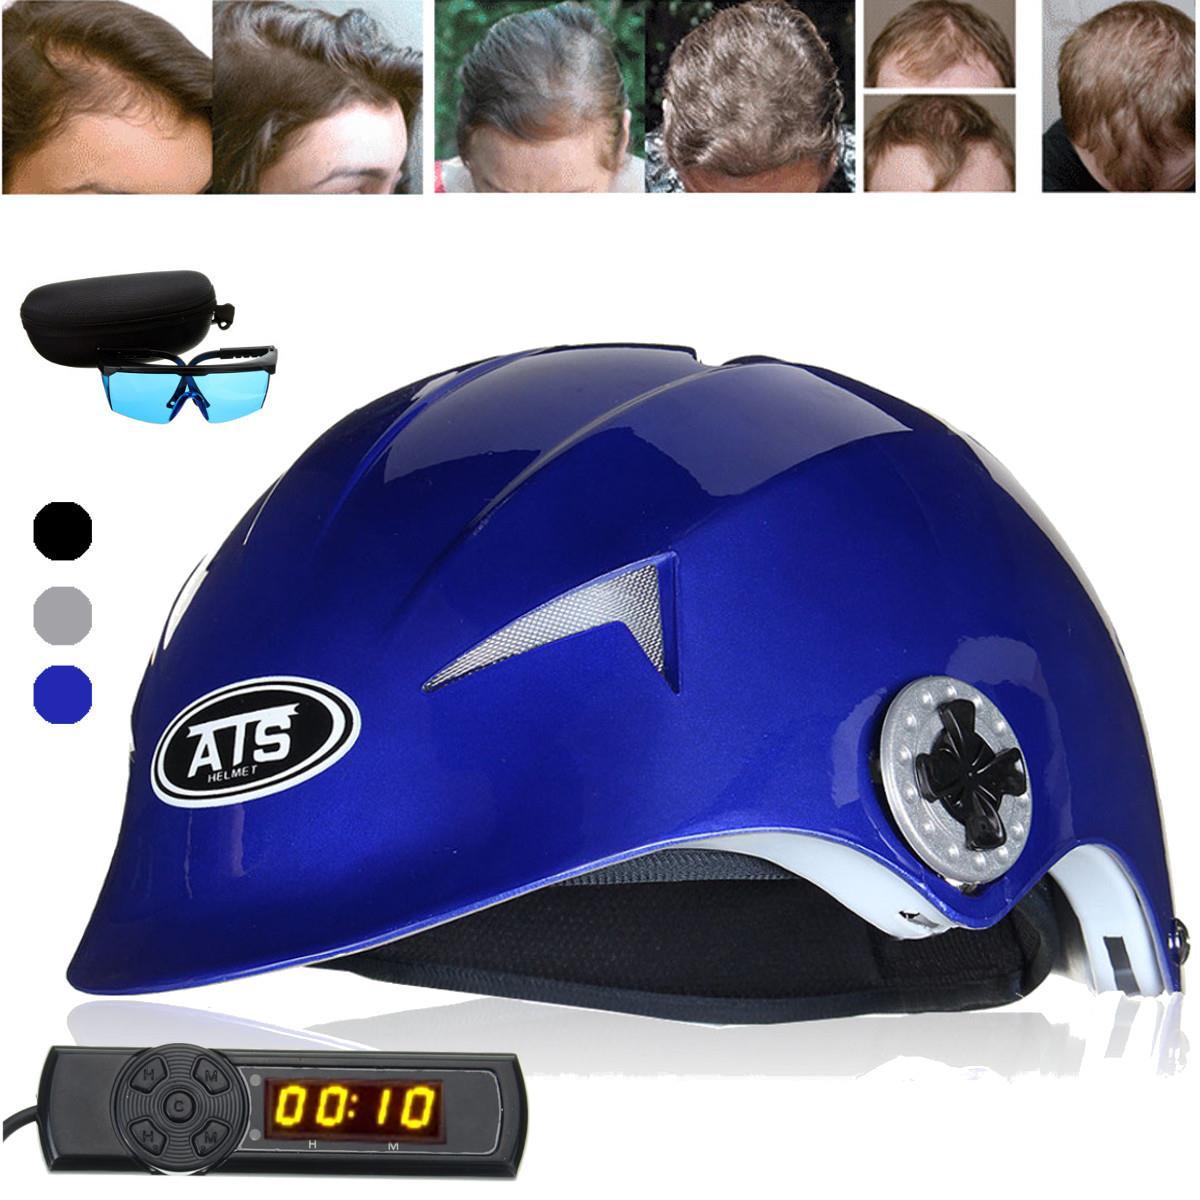 medical diodes laser hair loss treatment solution helmet